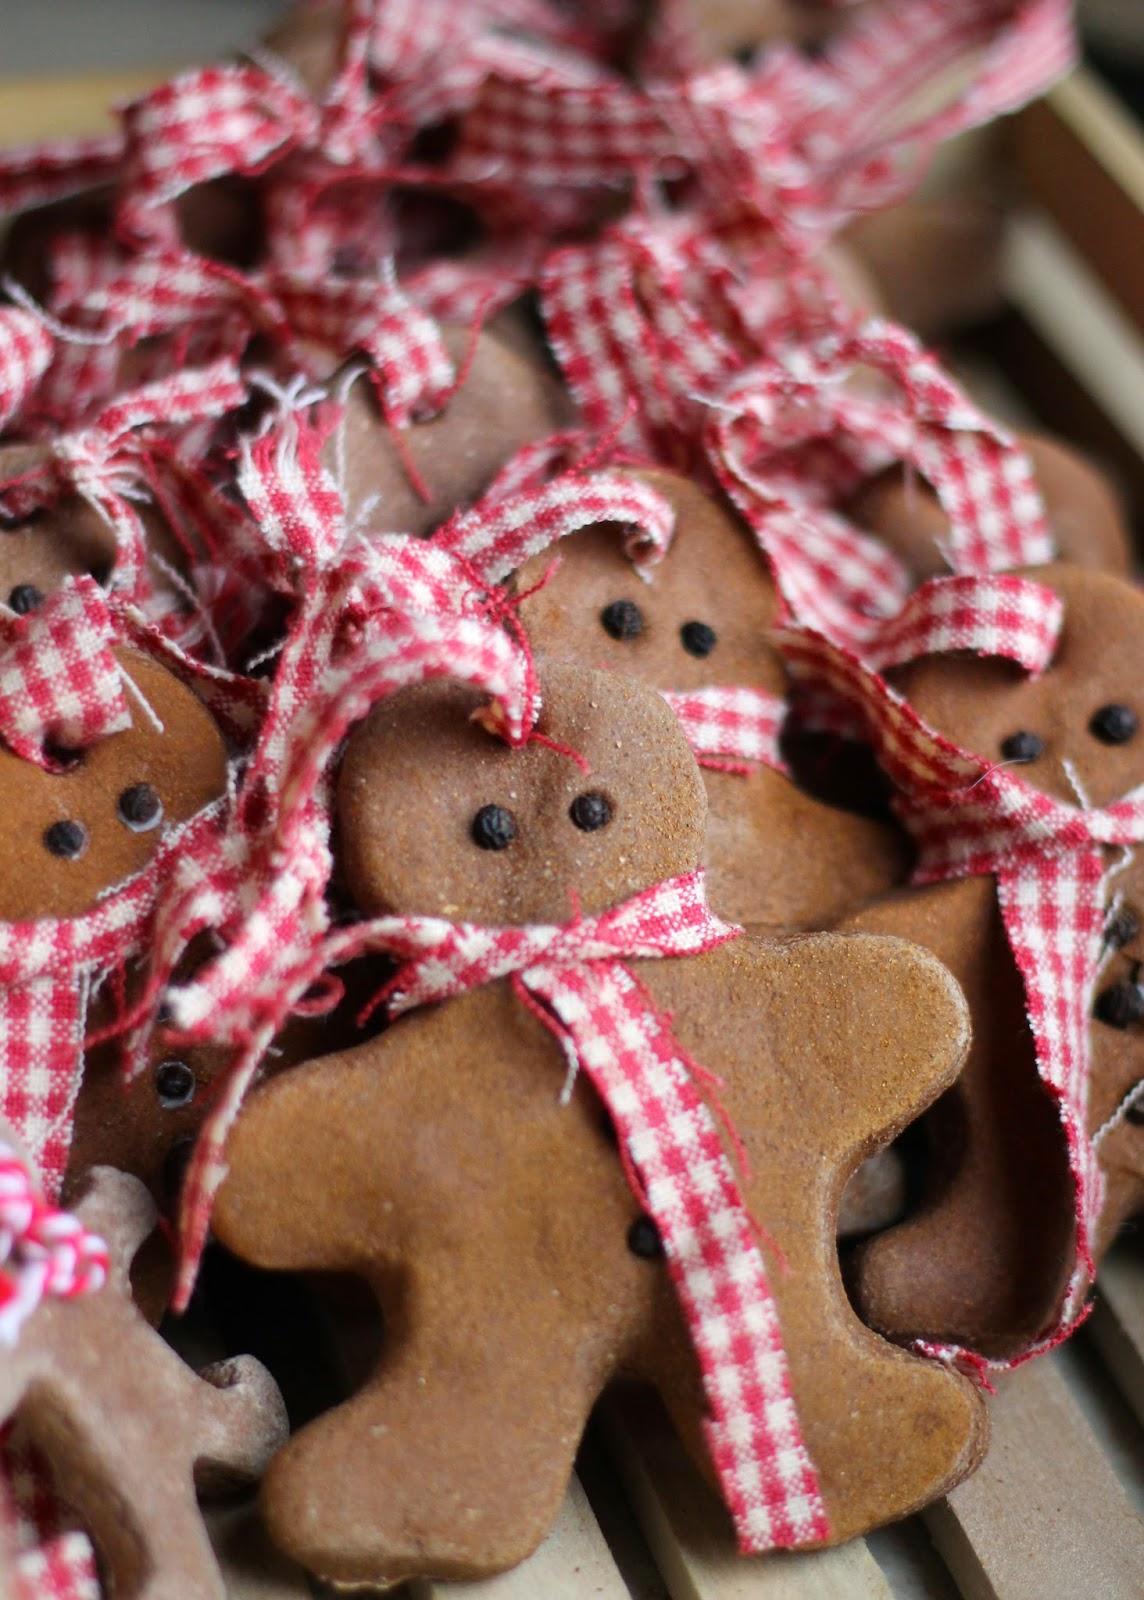 Homemade Christmas Ornaments Dough Cinnamon : Where your treasure is cinnamon salt dough ornaments